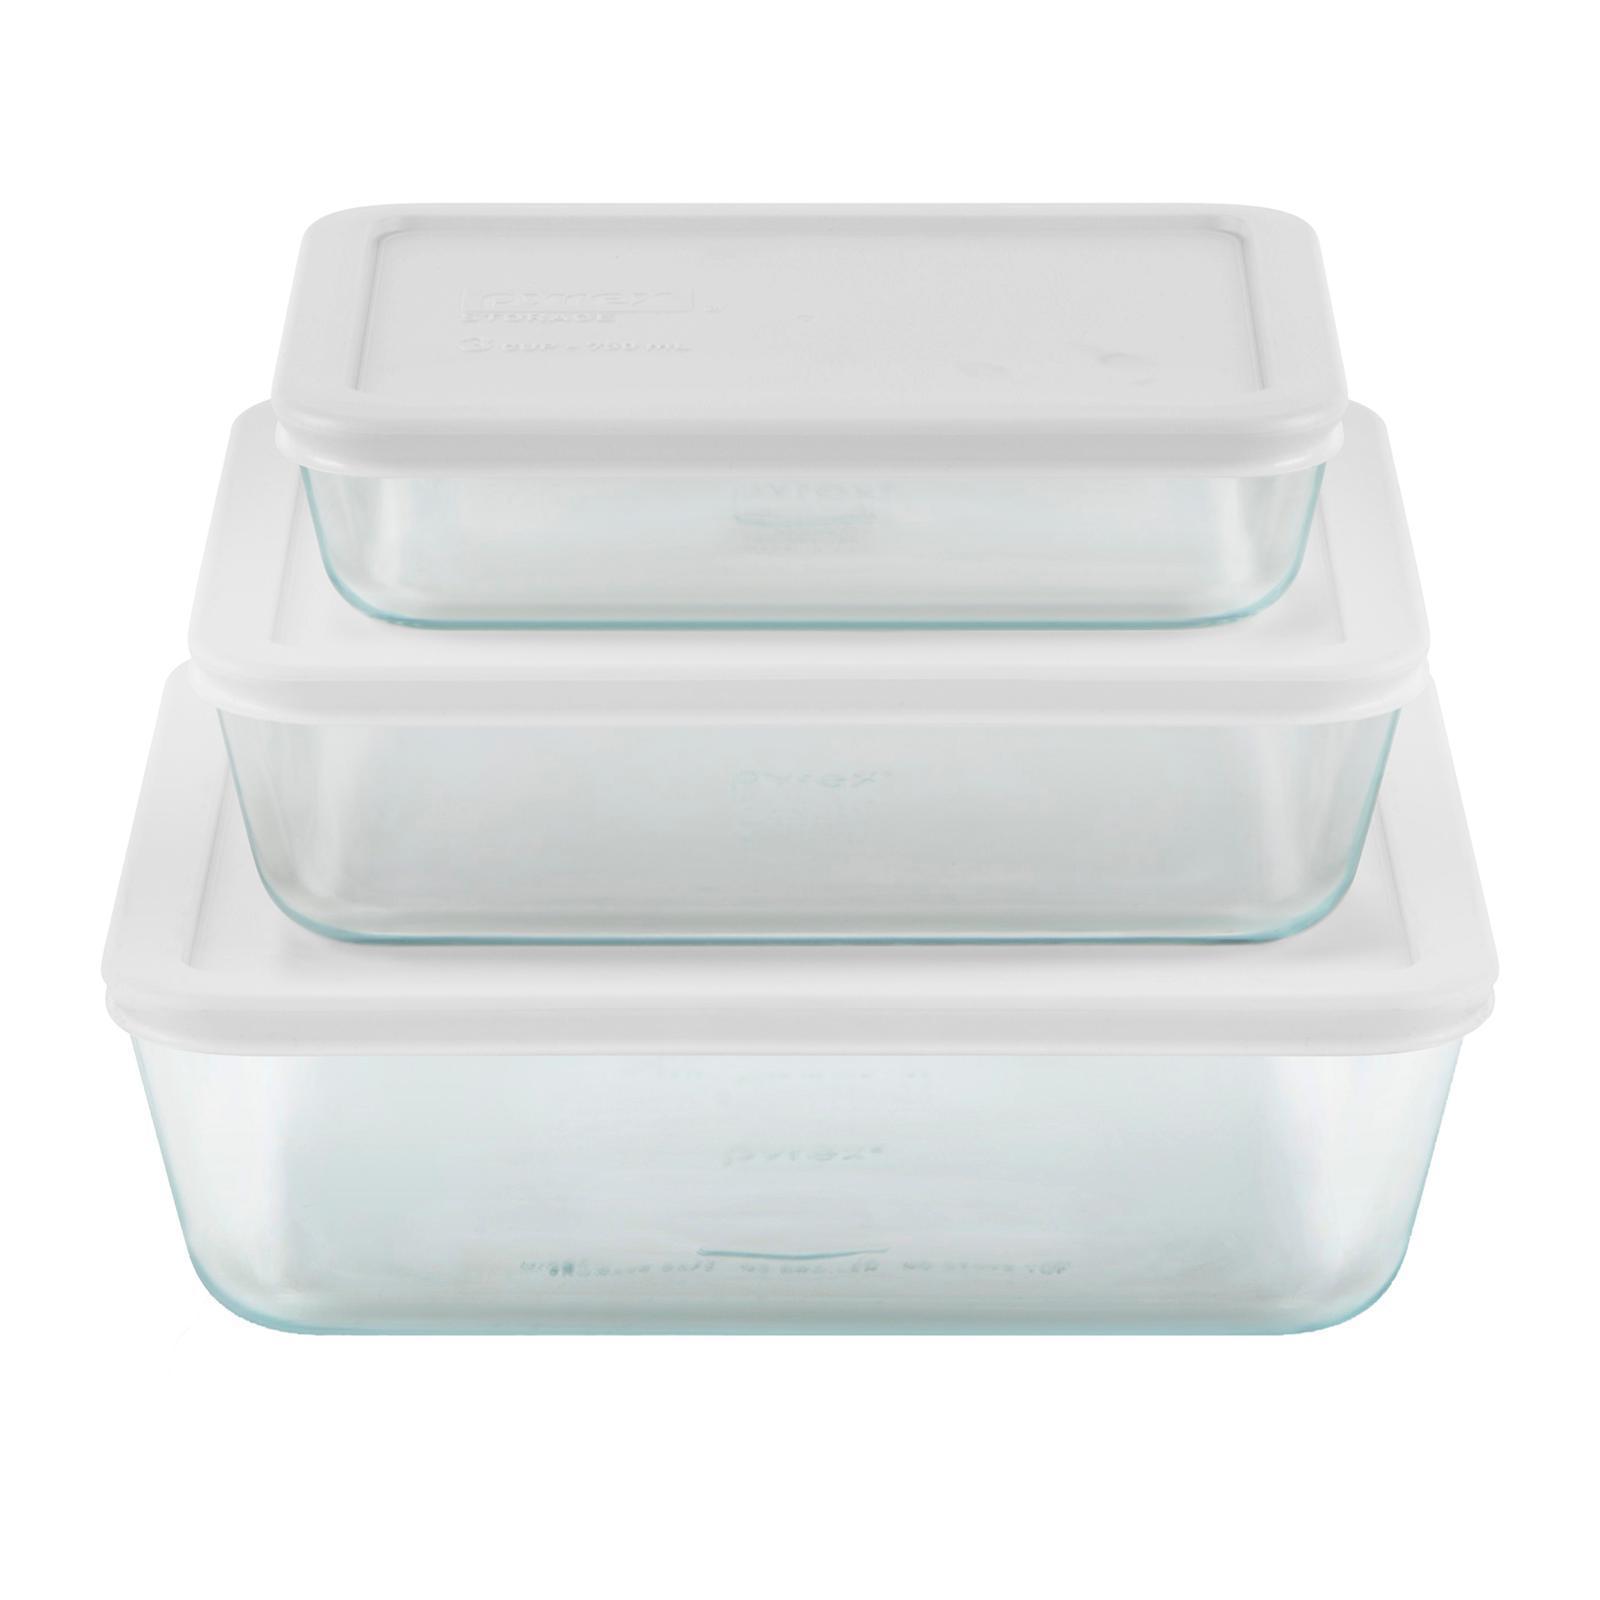 Pyrex 6 PCS Rectangle Glass Simply Store Set with White Lids (750 ML 1.4 L 2.6 L)